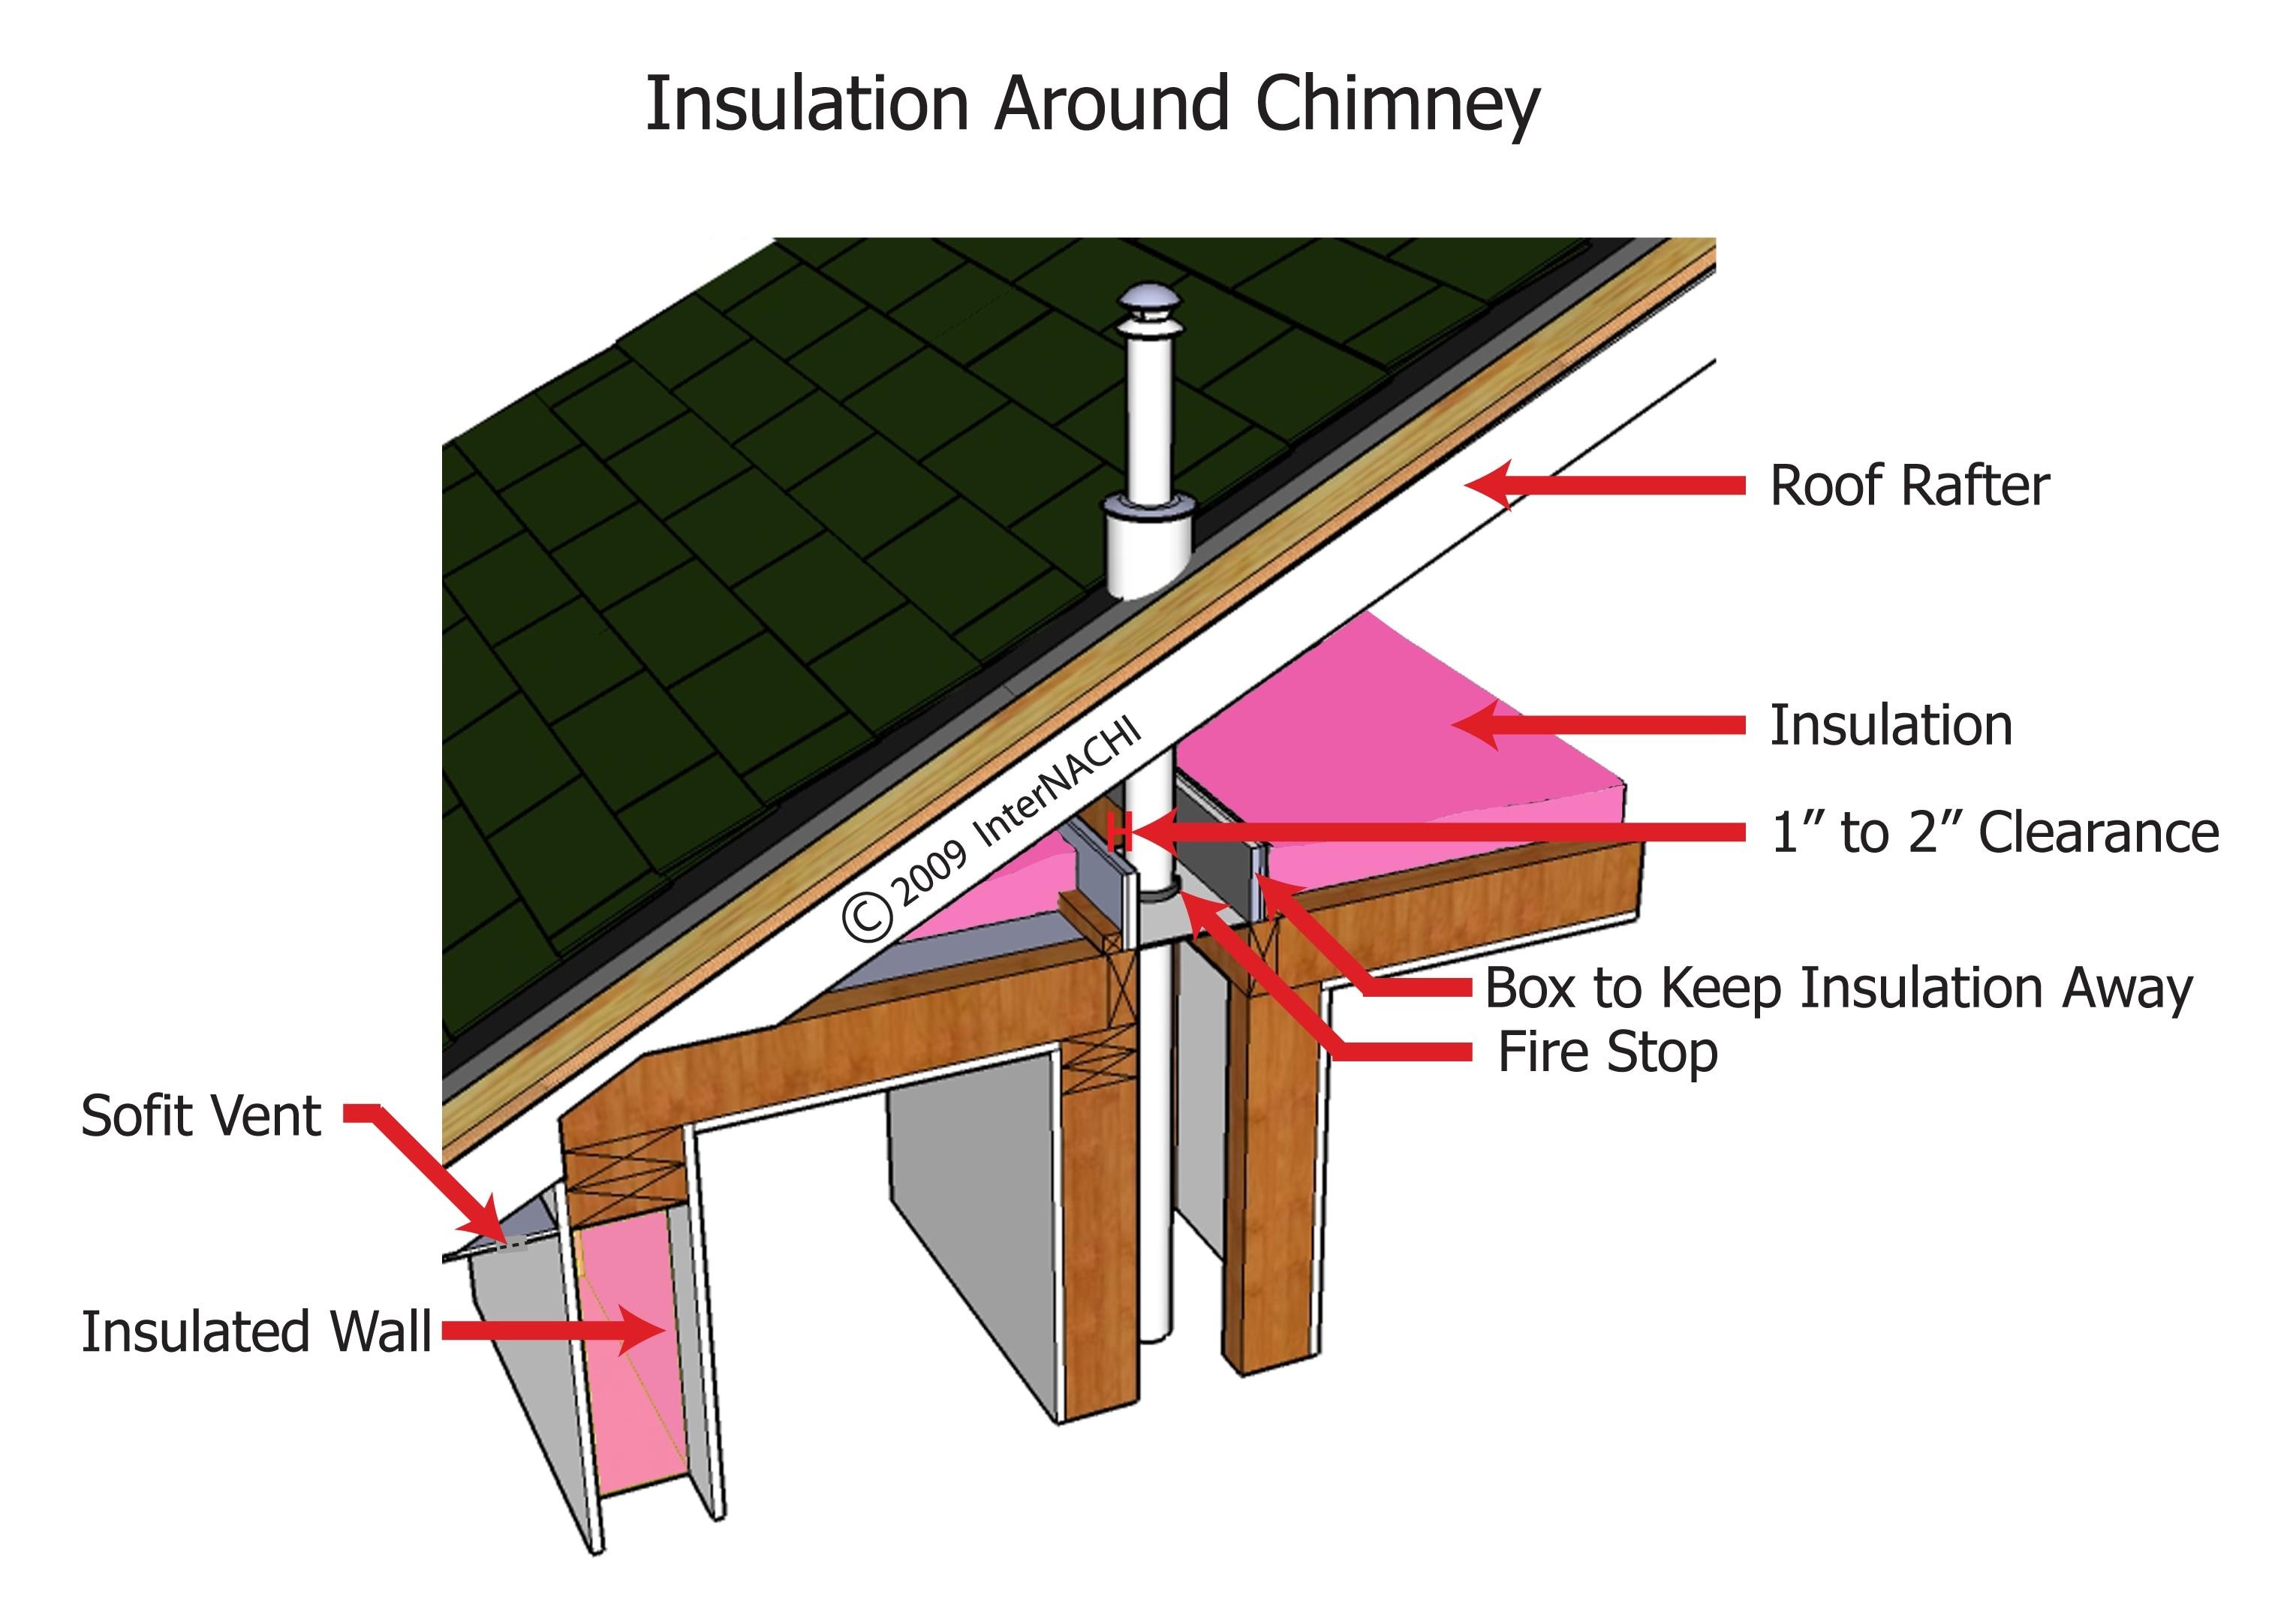 Insulation Around Chimney